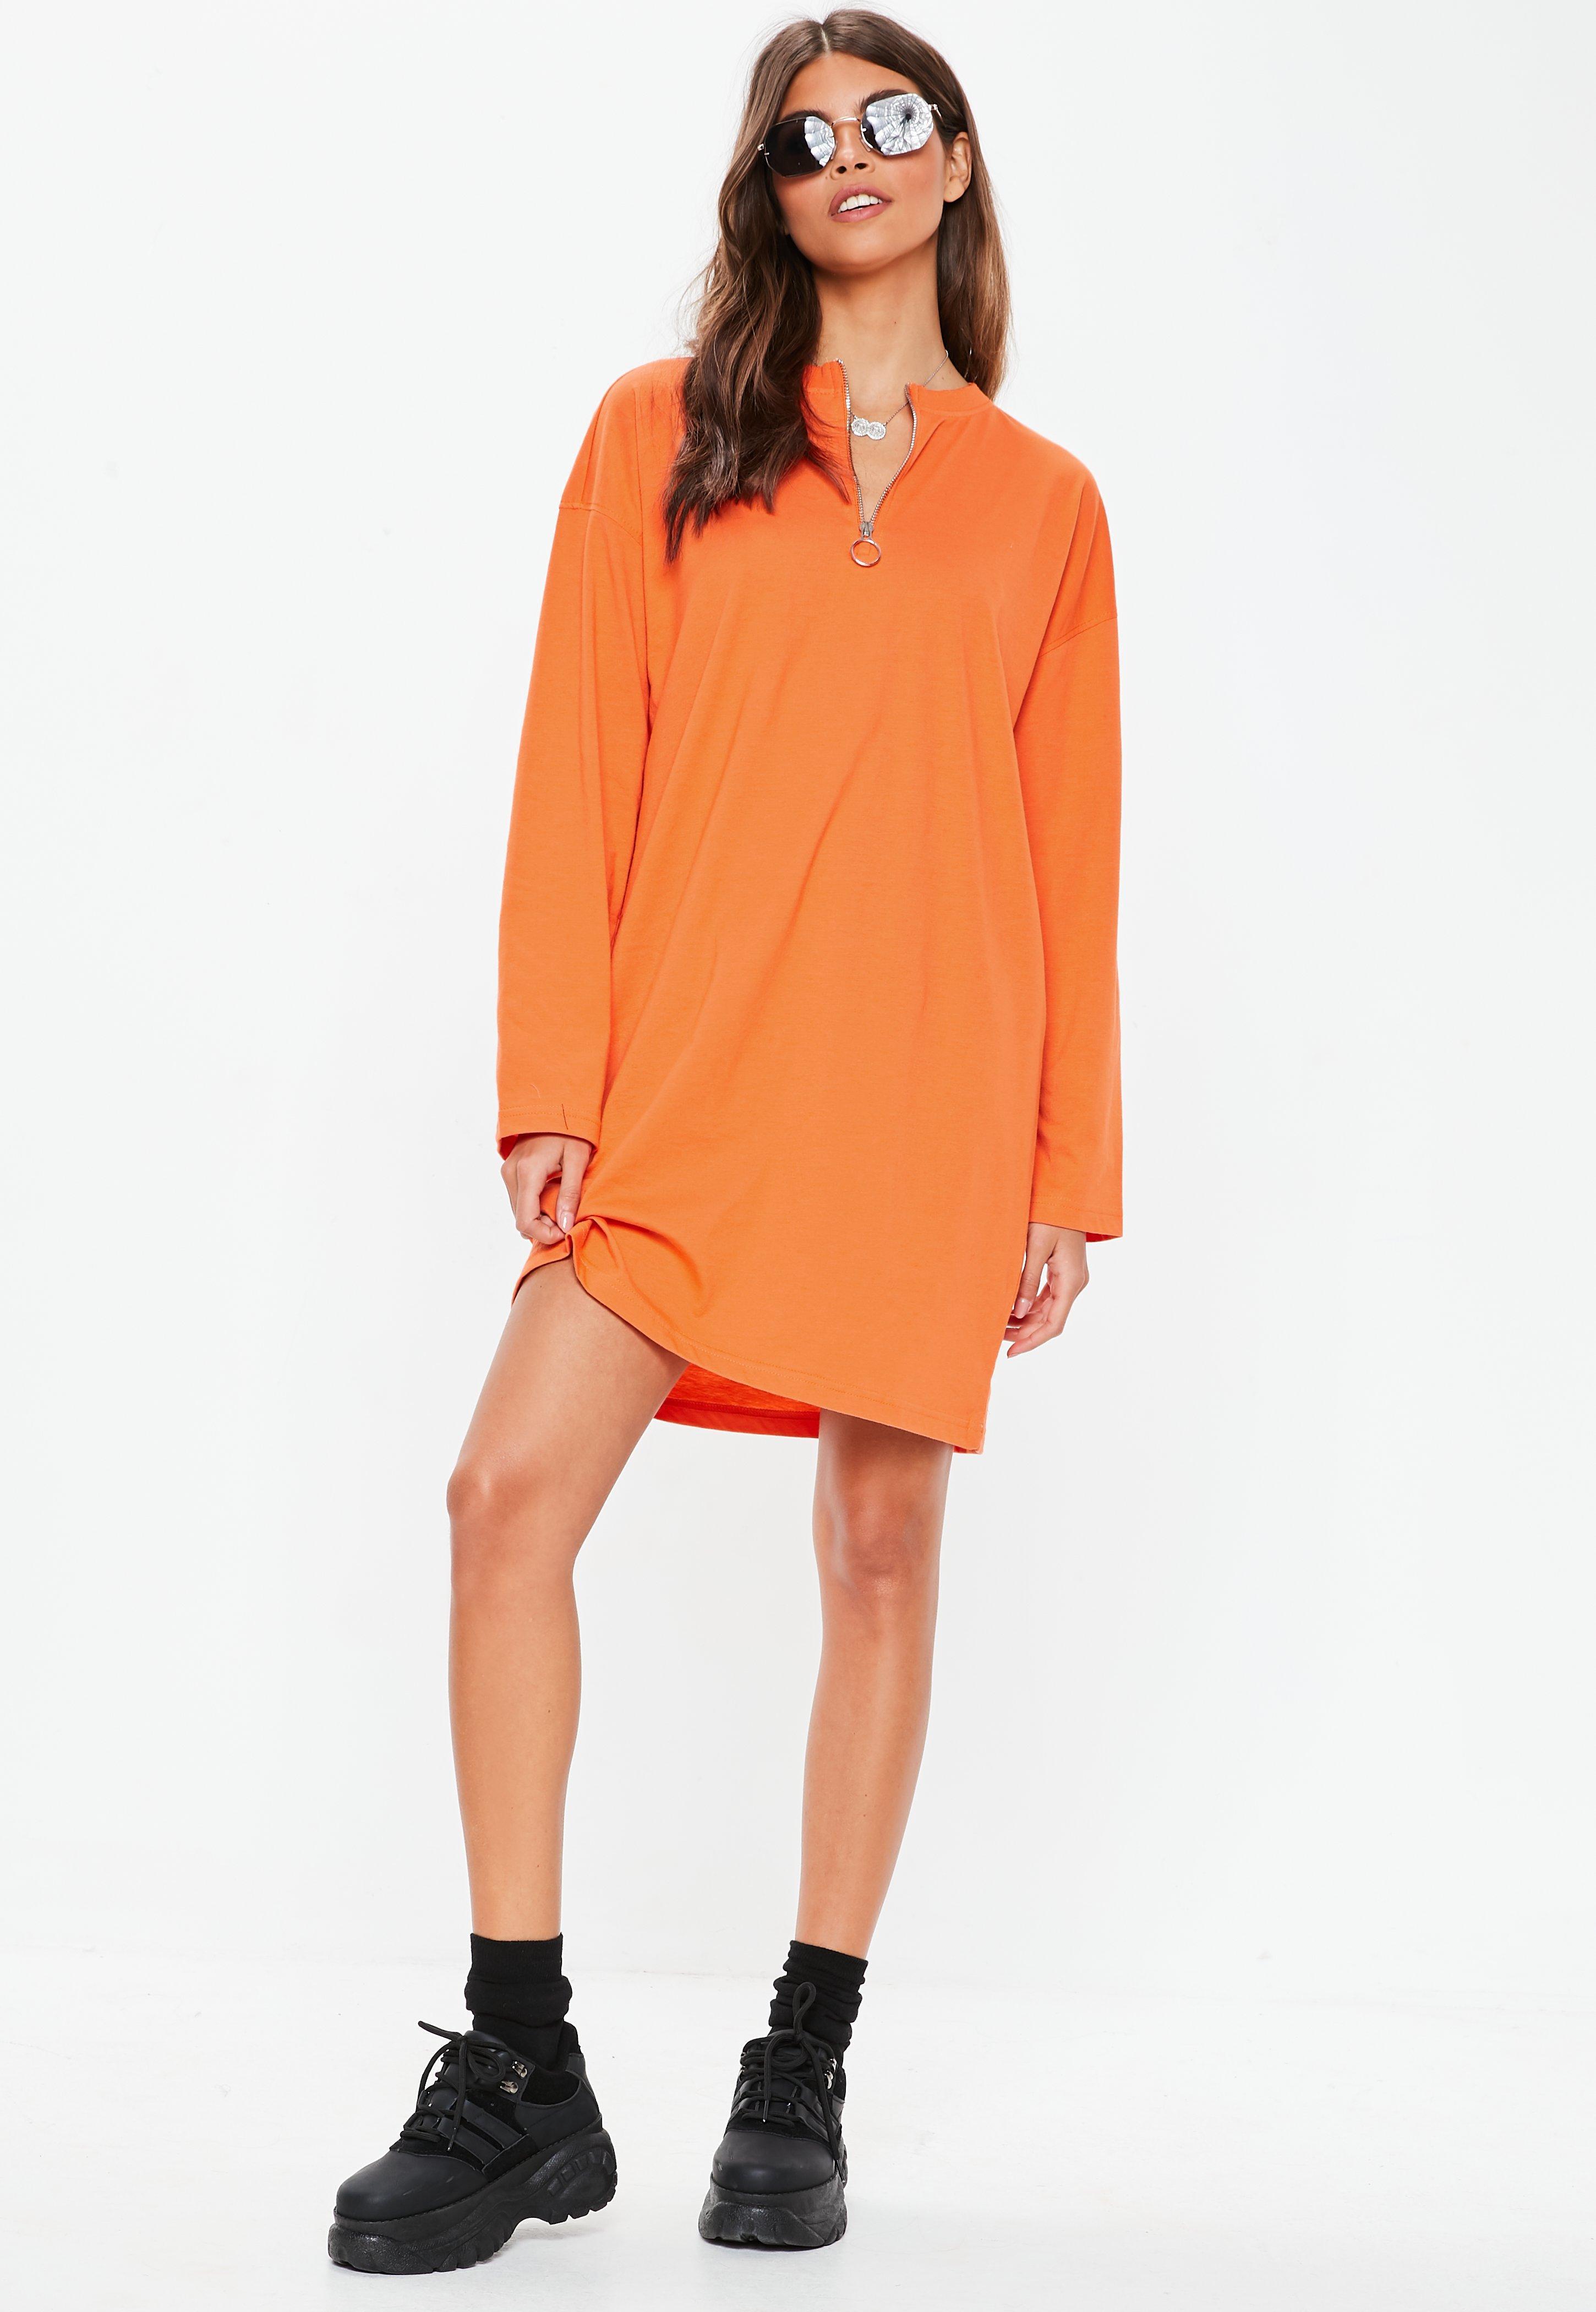 a3b77cfd16 Missguided - Orange Long Sleeve Ring Zip Oversized T Shirt Dress - Lyst.  View fullscreen